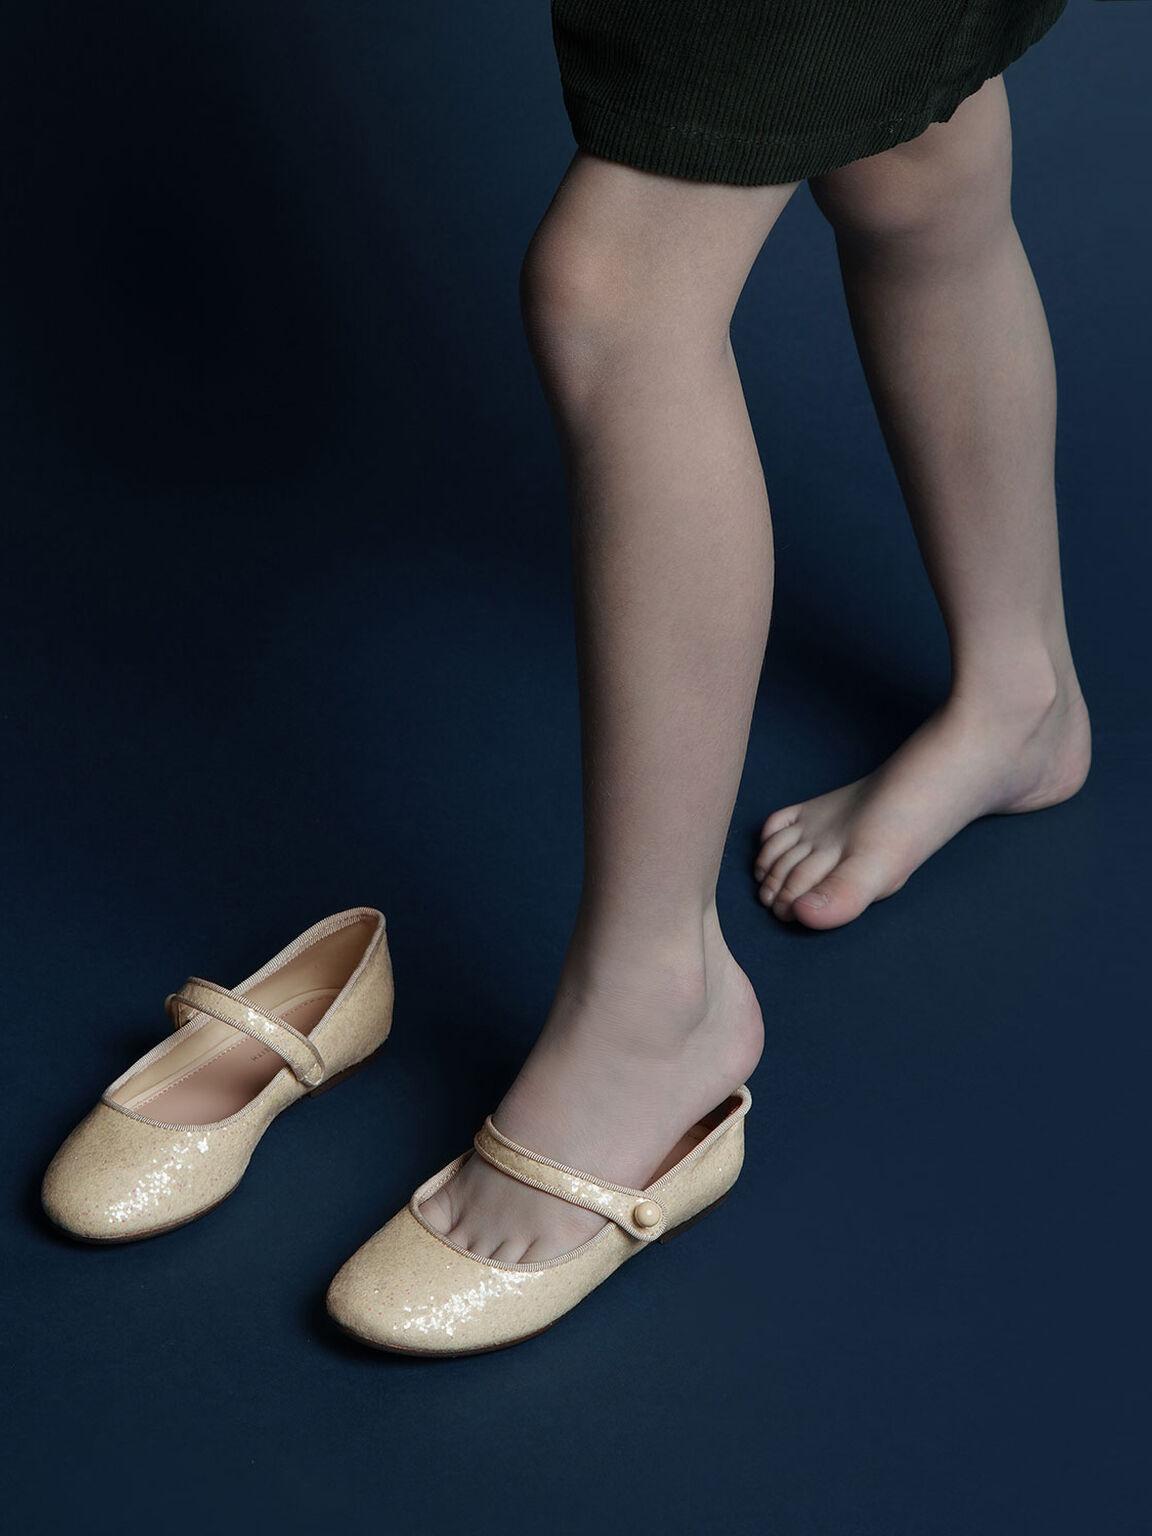 Girls' Glitter Mary Jane Flats, Beige, hi-res